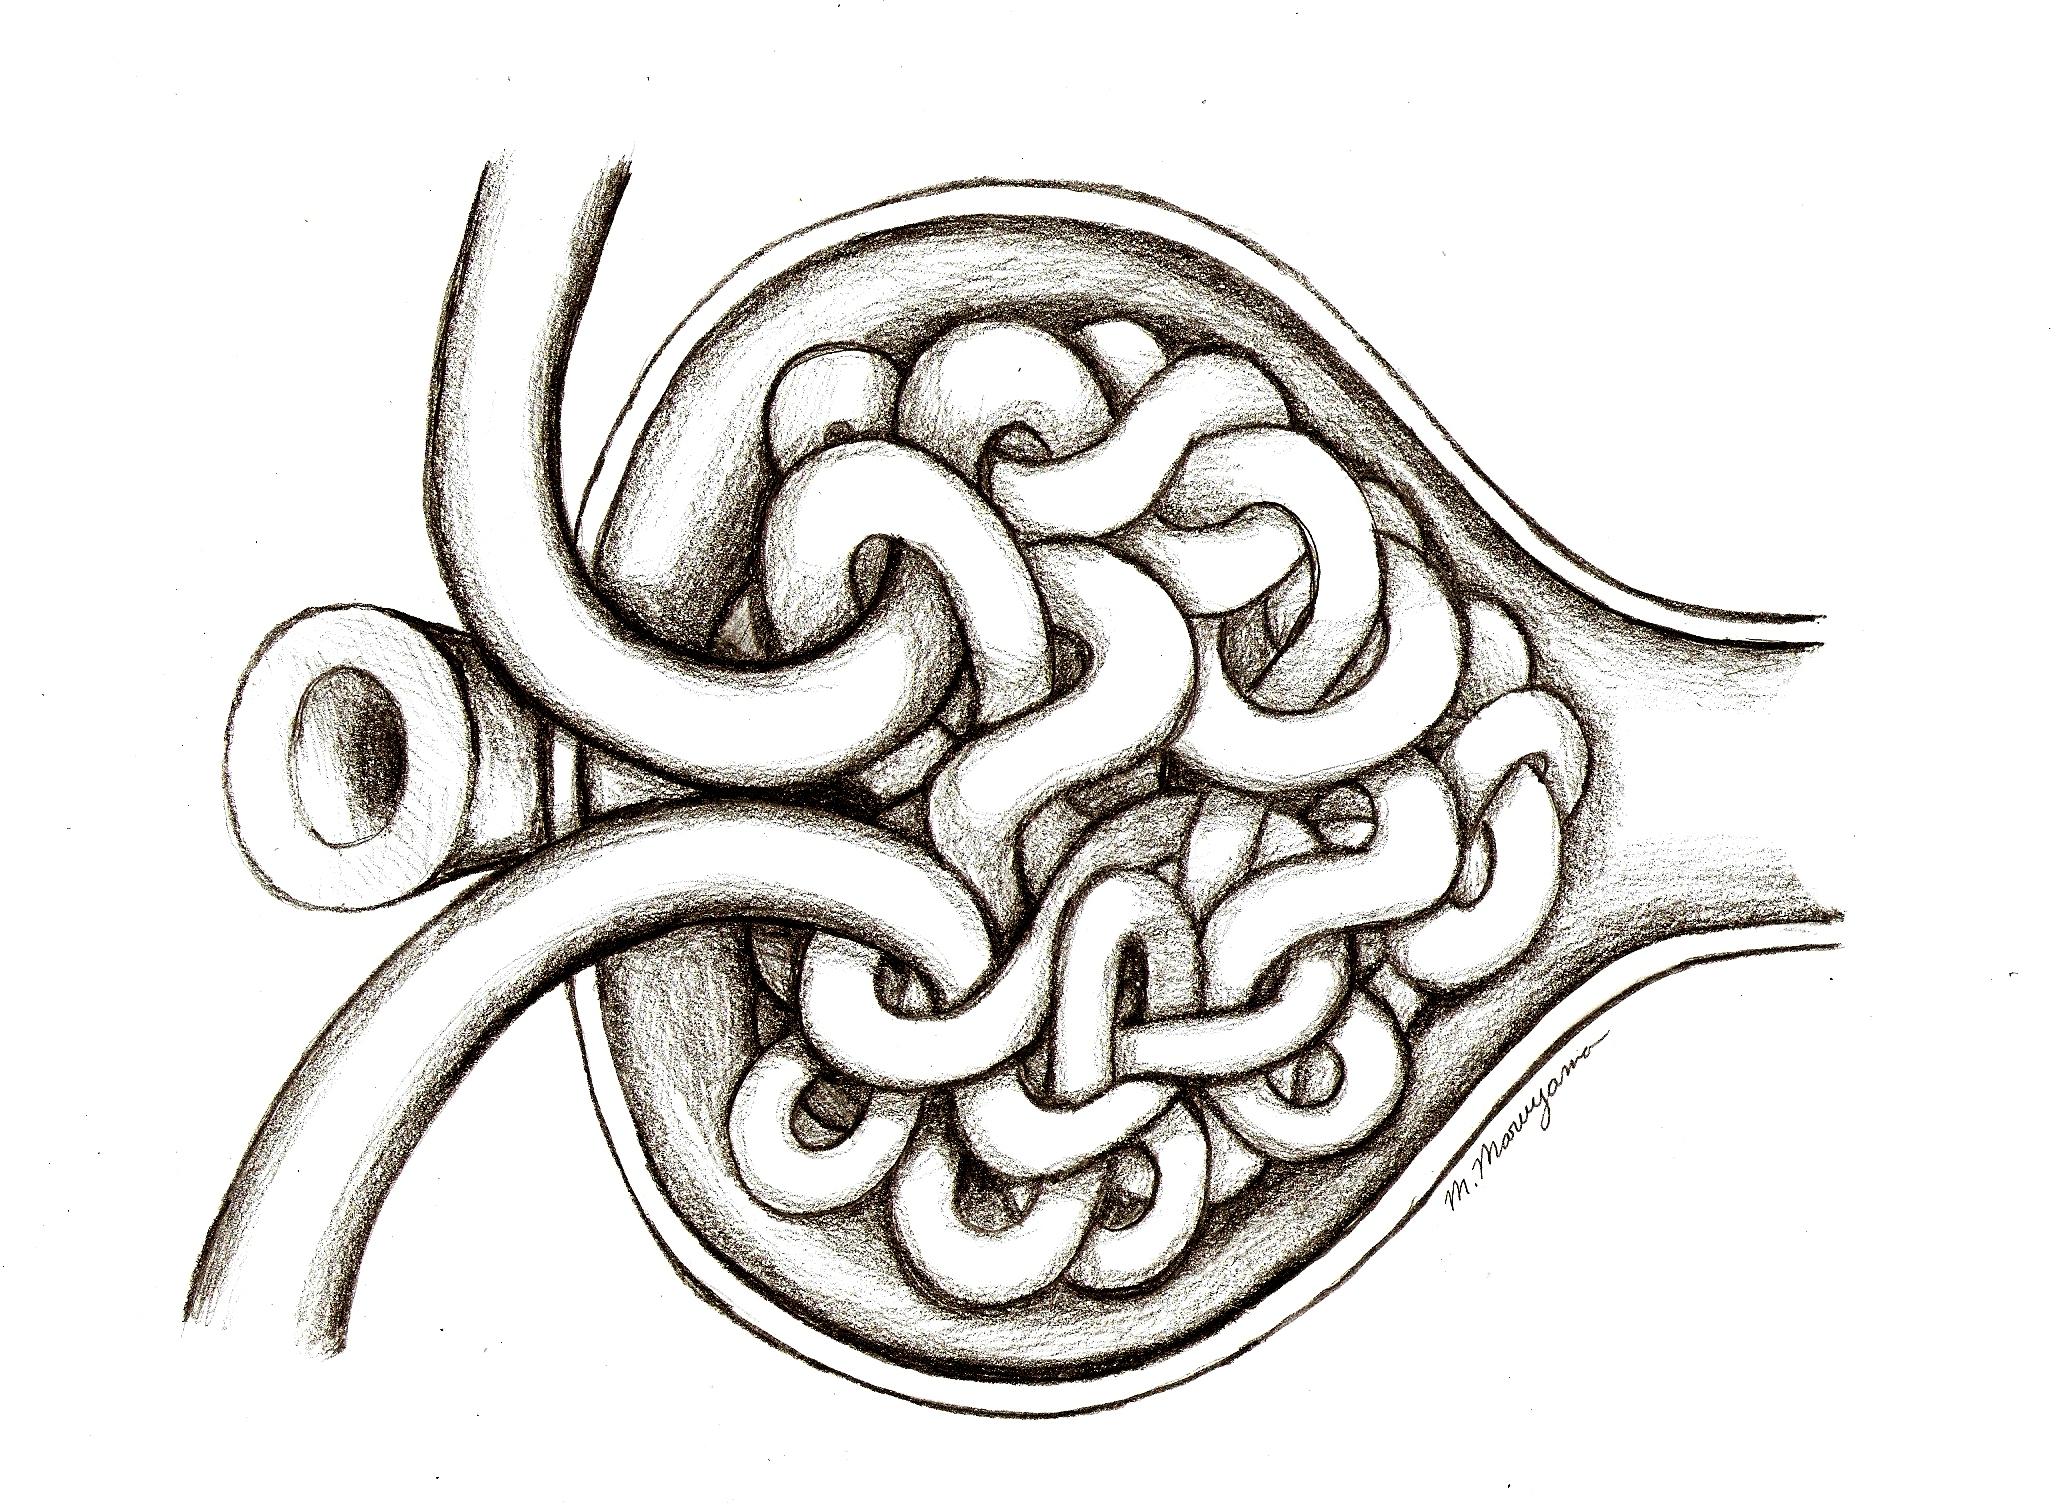 glomerulus corpuscle open michiko maruyama